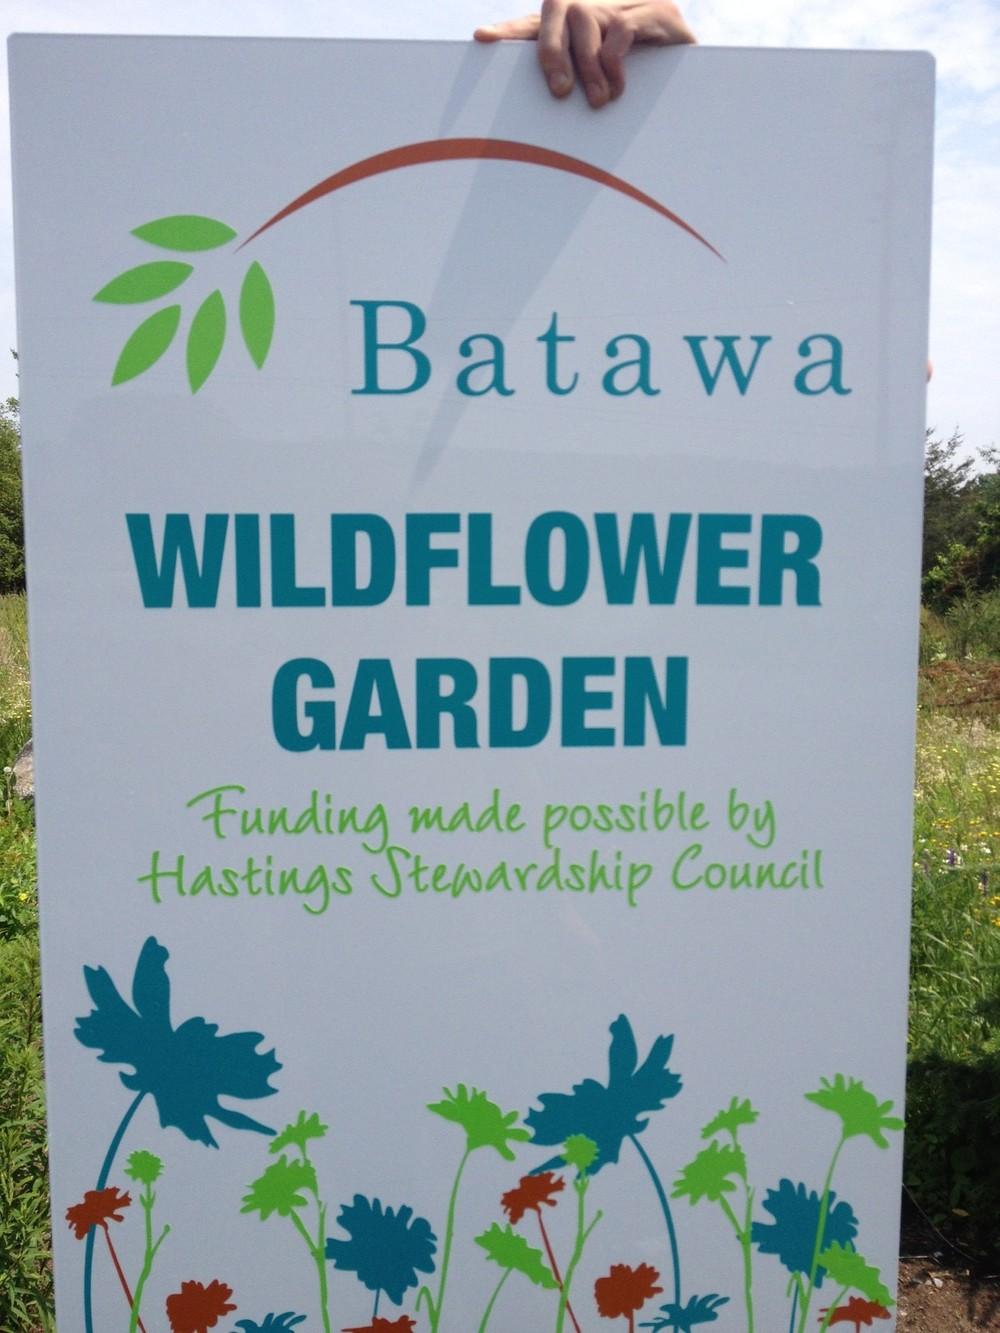 BatawaWildFlowerGarden.JPG